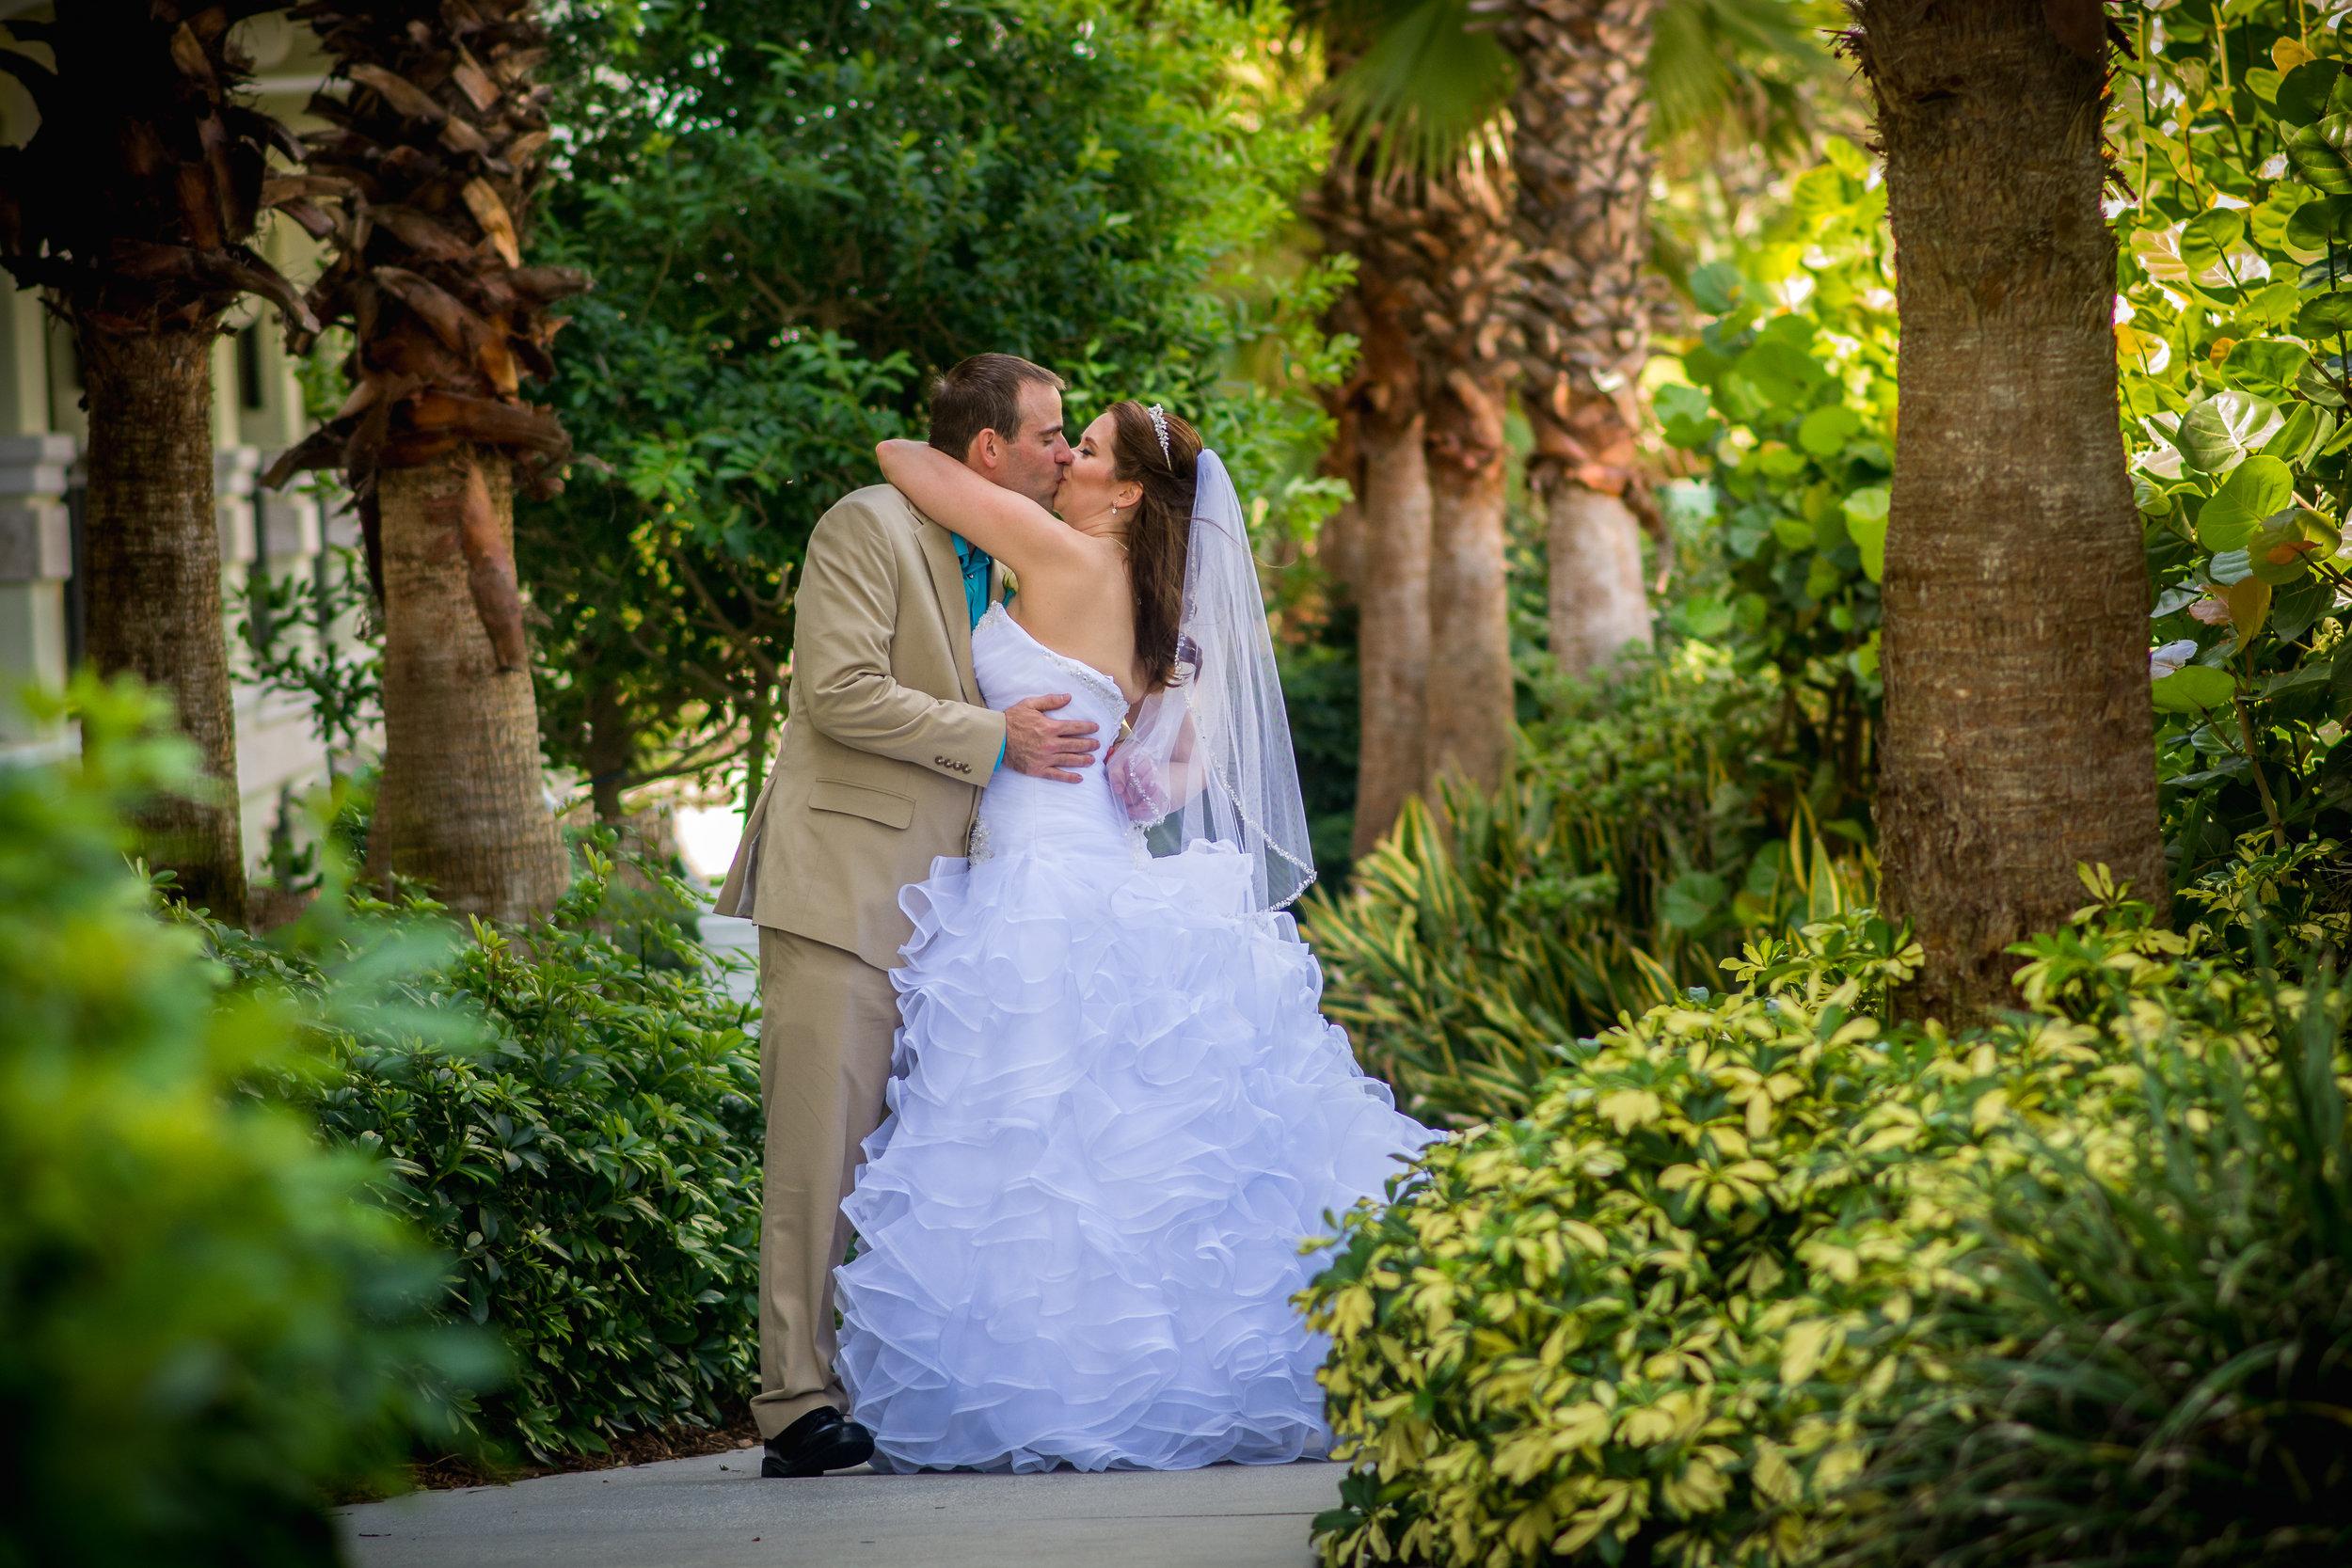 Imani J Portraits_Vero Beach Hotel and Spa_central Florida wedding photographer (1 of 1)-4.jpg